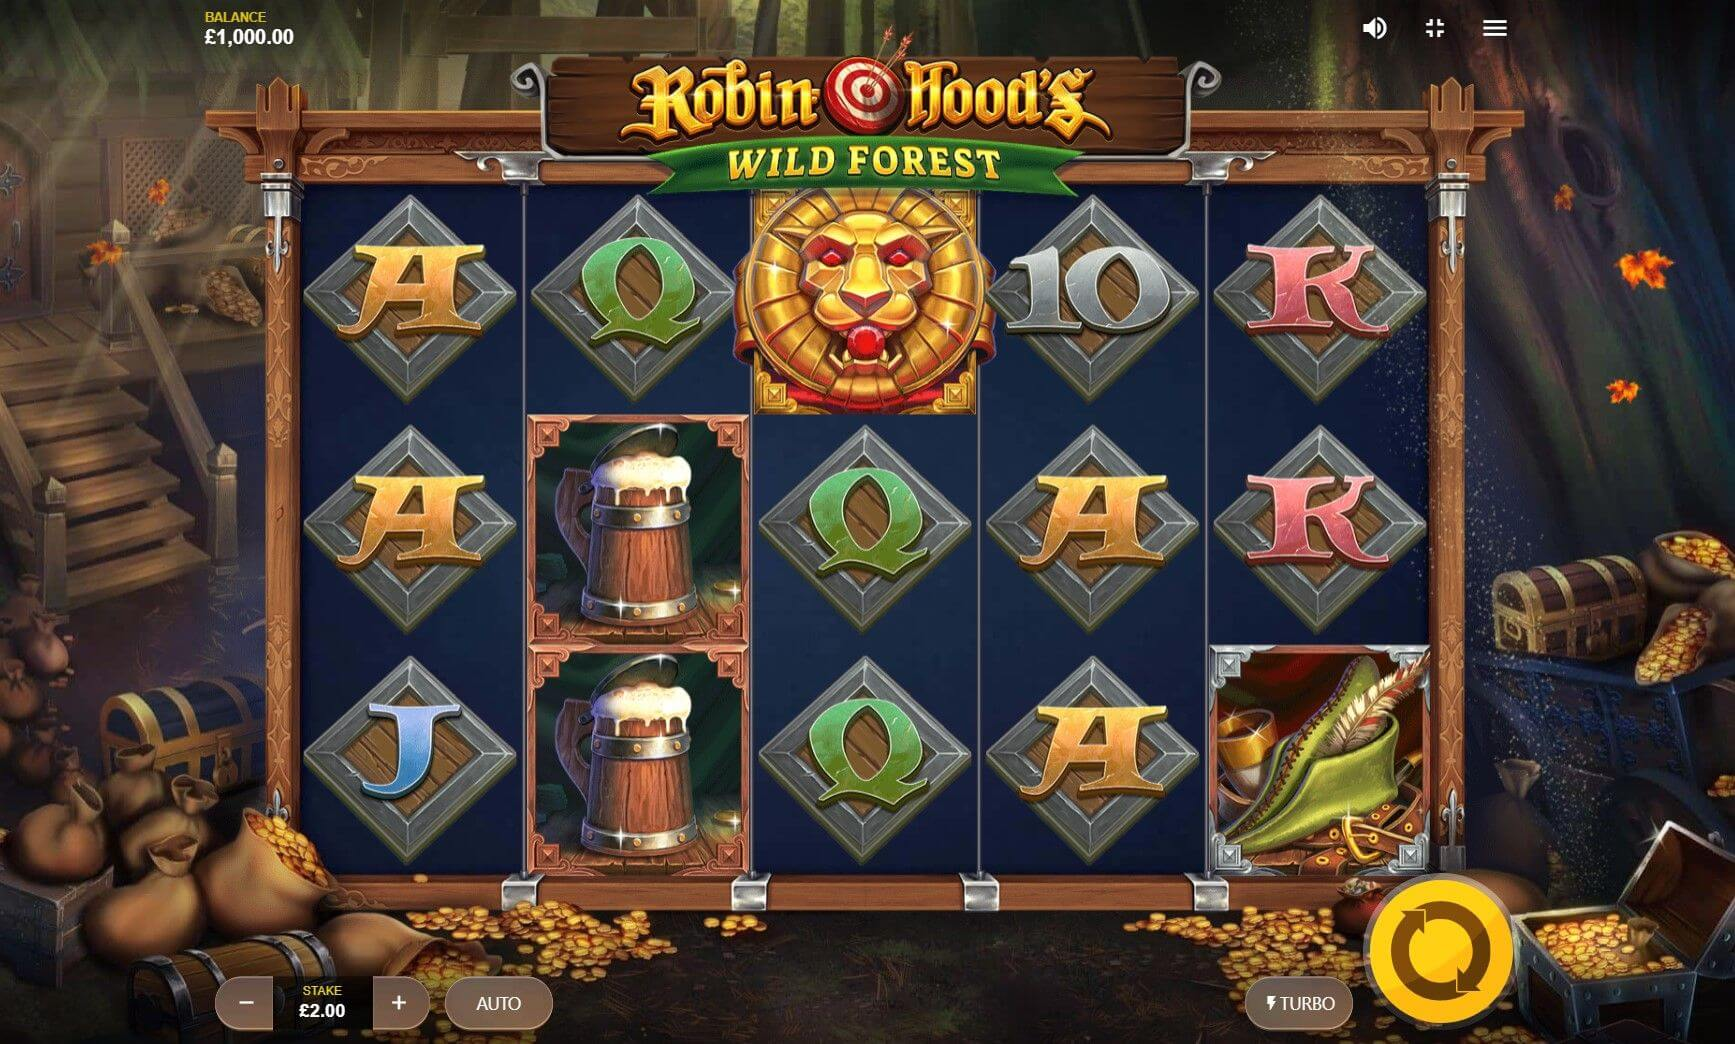 Robin Hood Slot Gameplay